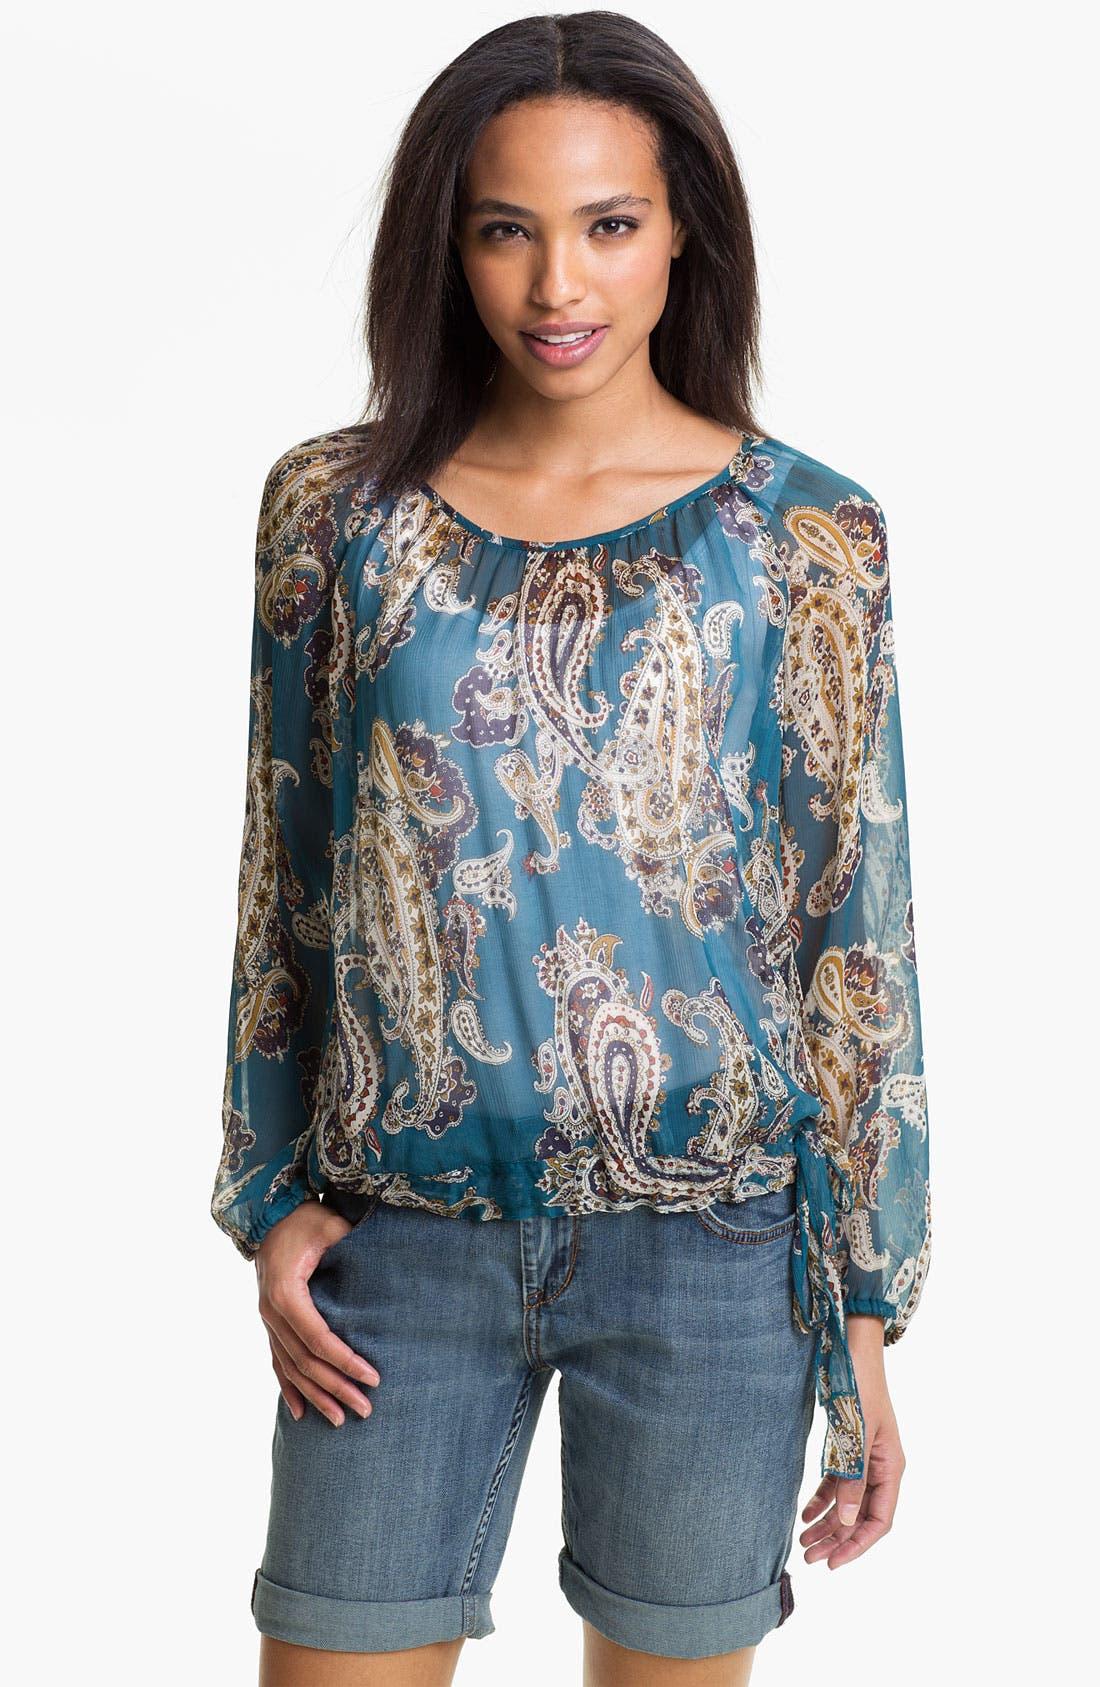 Main Image - Lucky Brand 'Bianca' Paisley Blouse